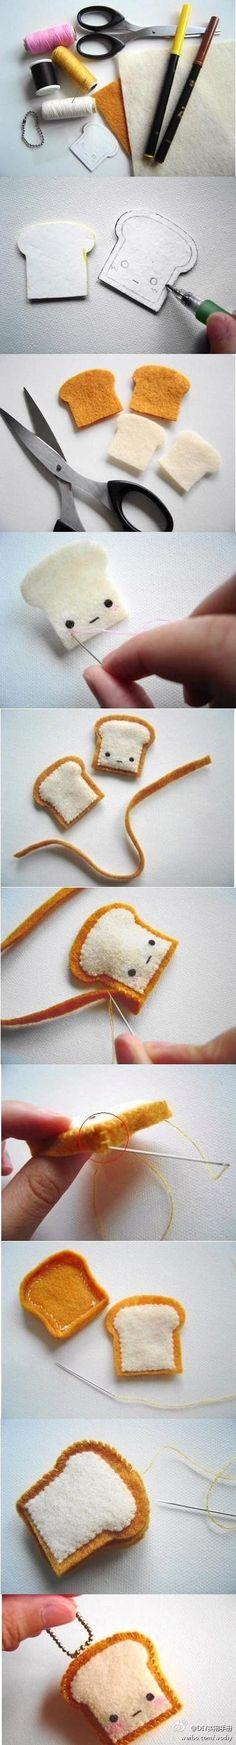 felt slice of bread